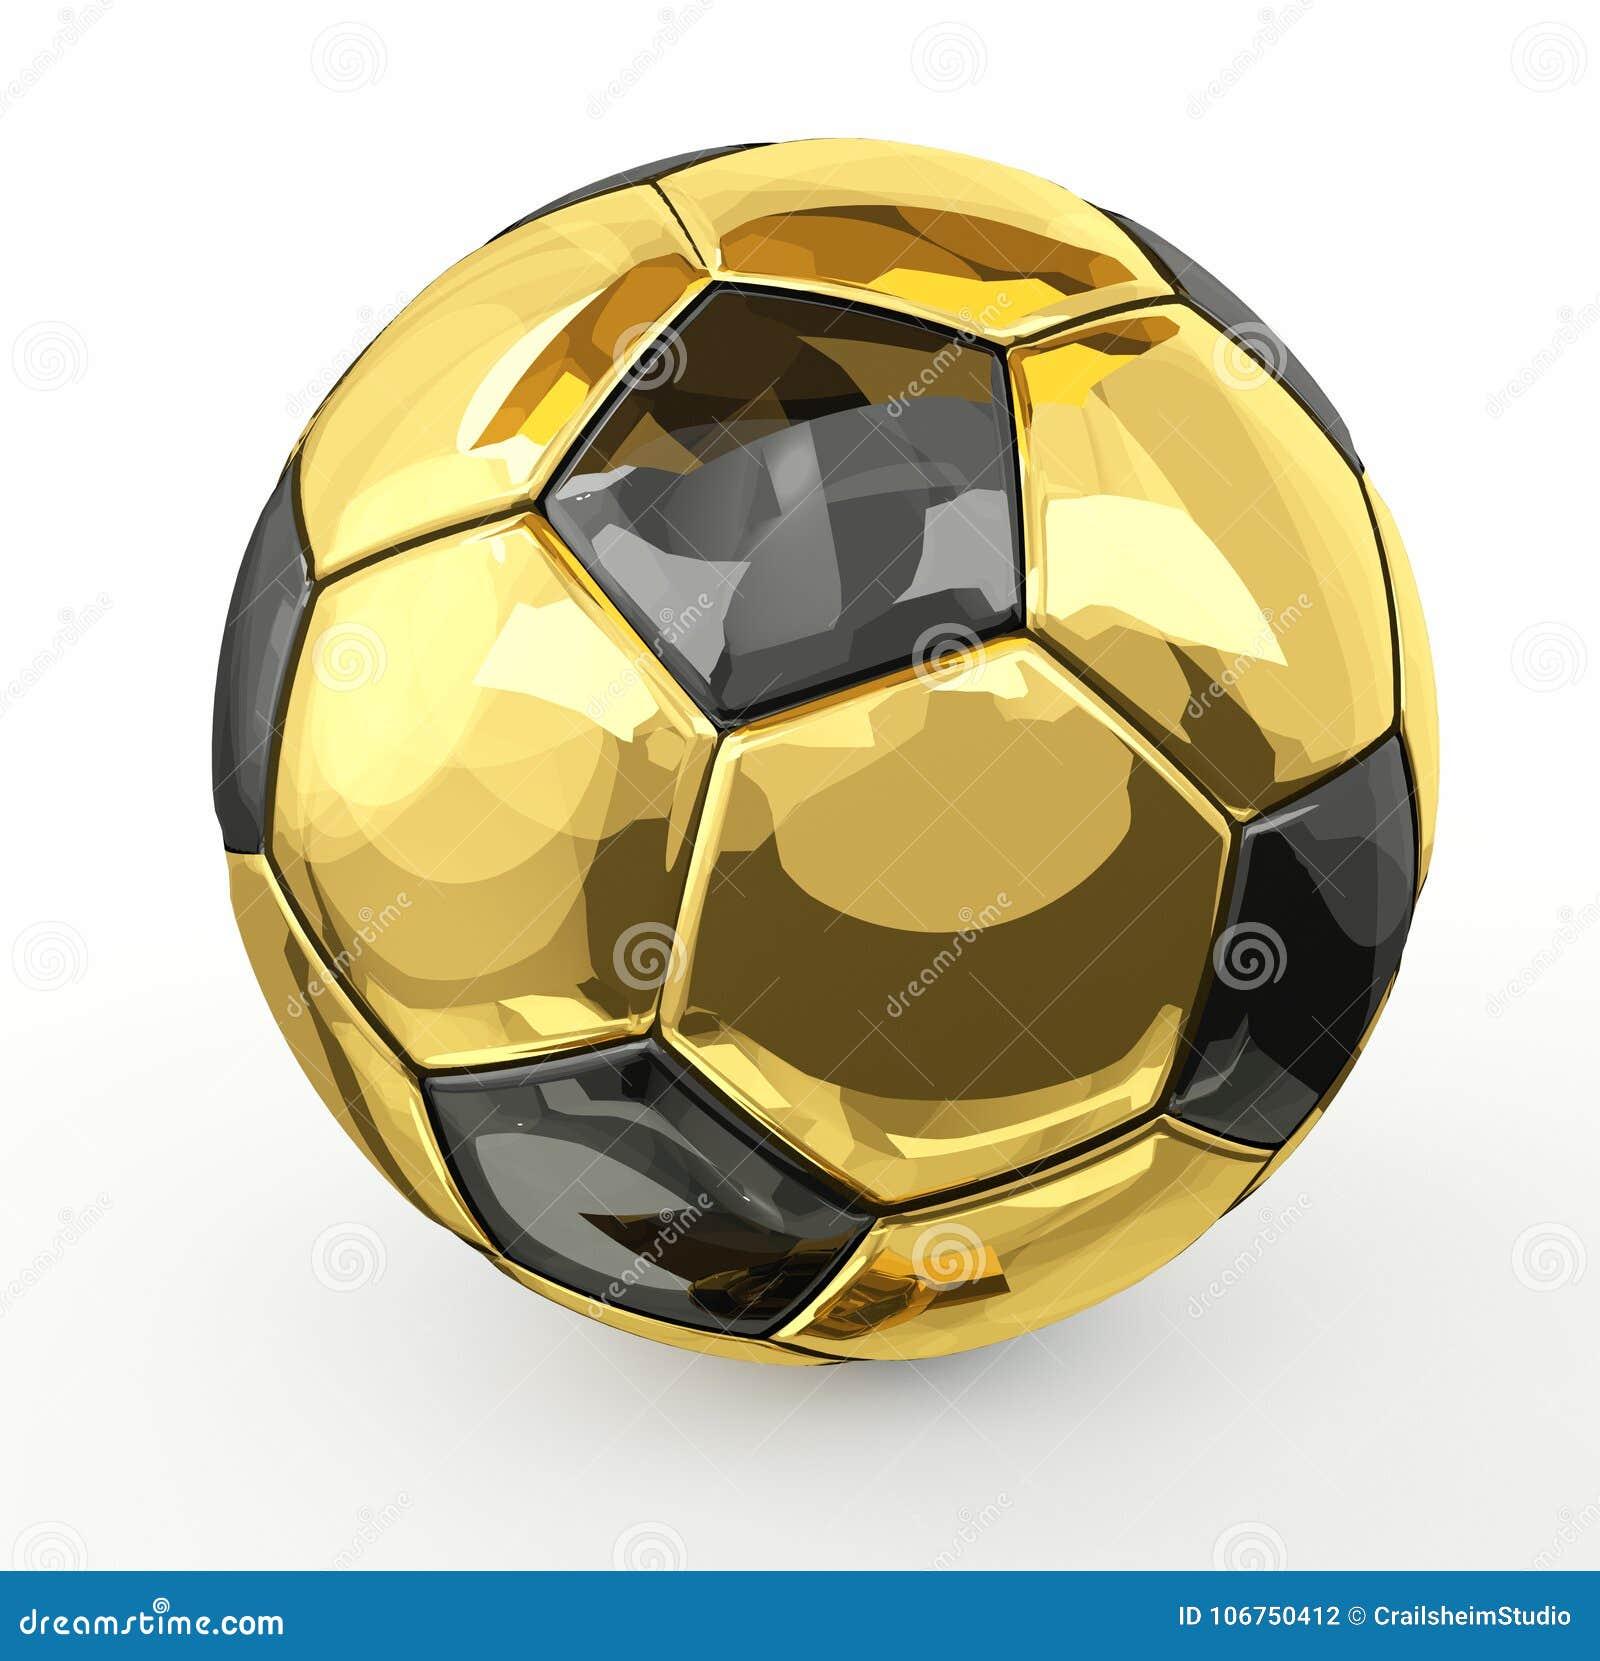 dc5a426af Isolated golden metallic 3d rendering soccer football ball illustration  design